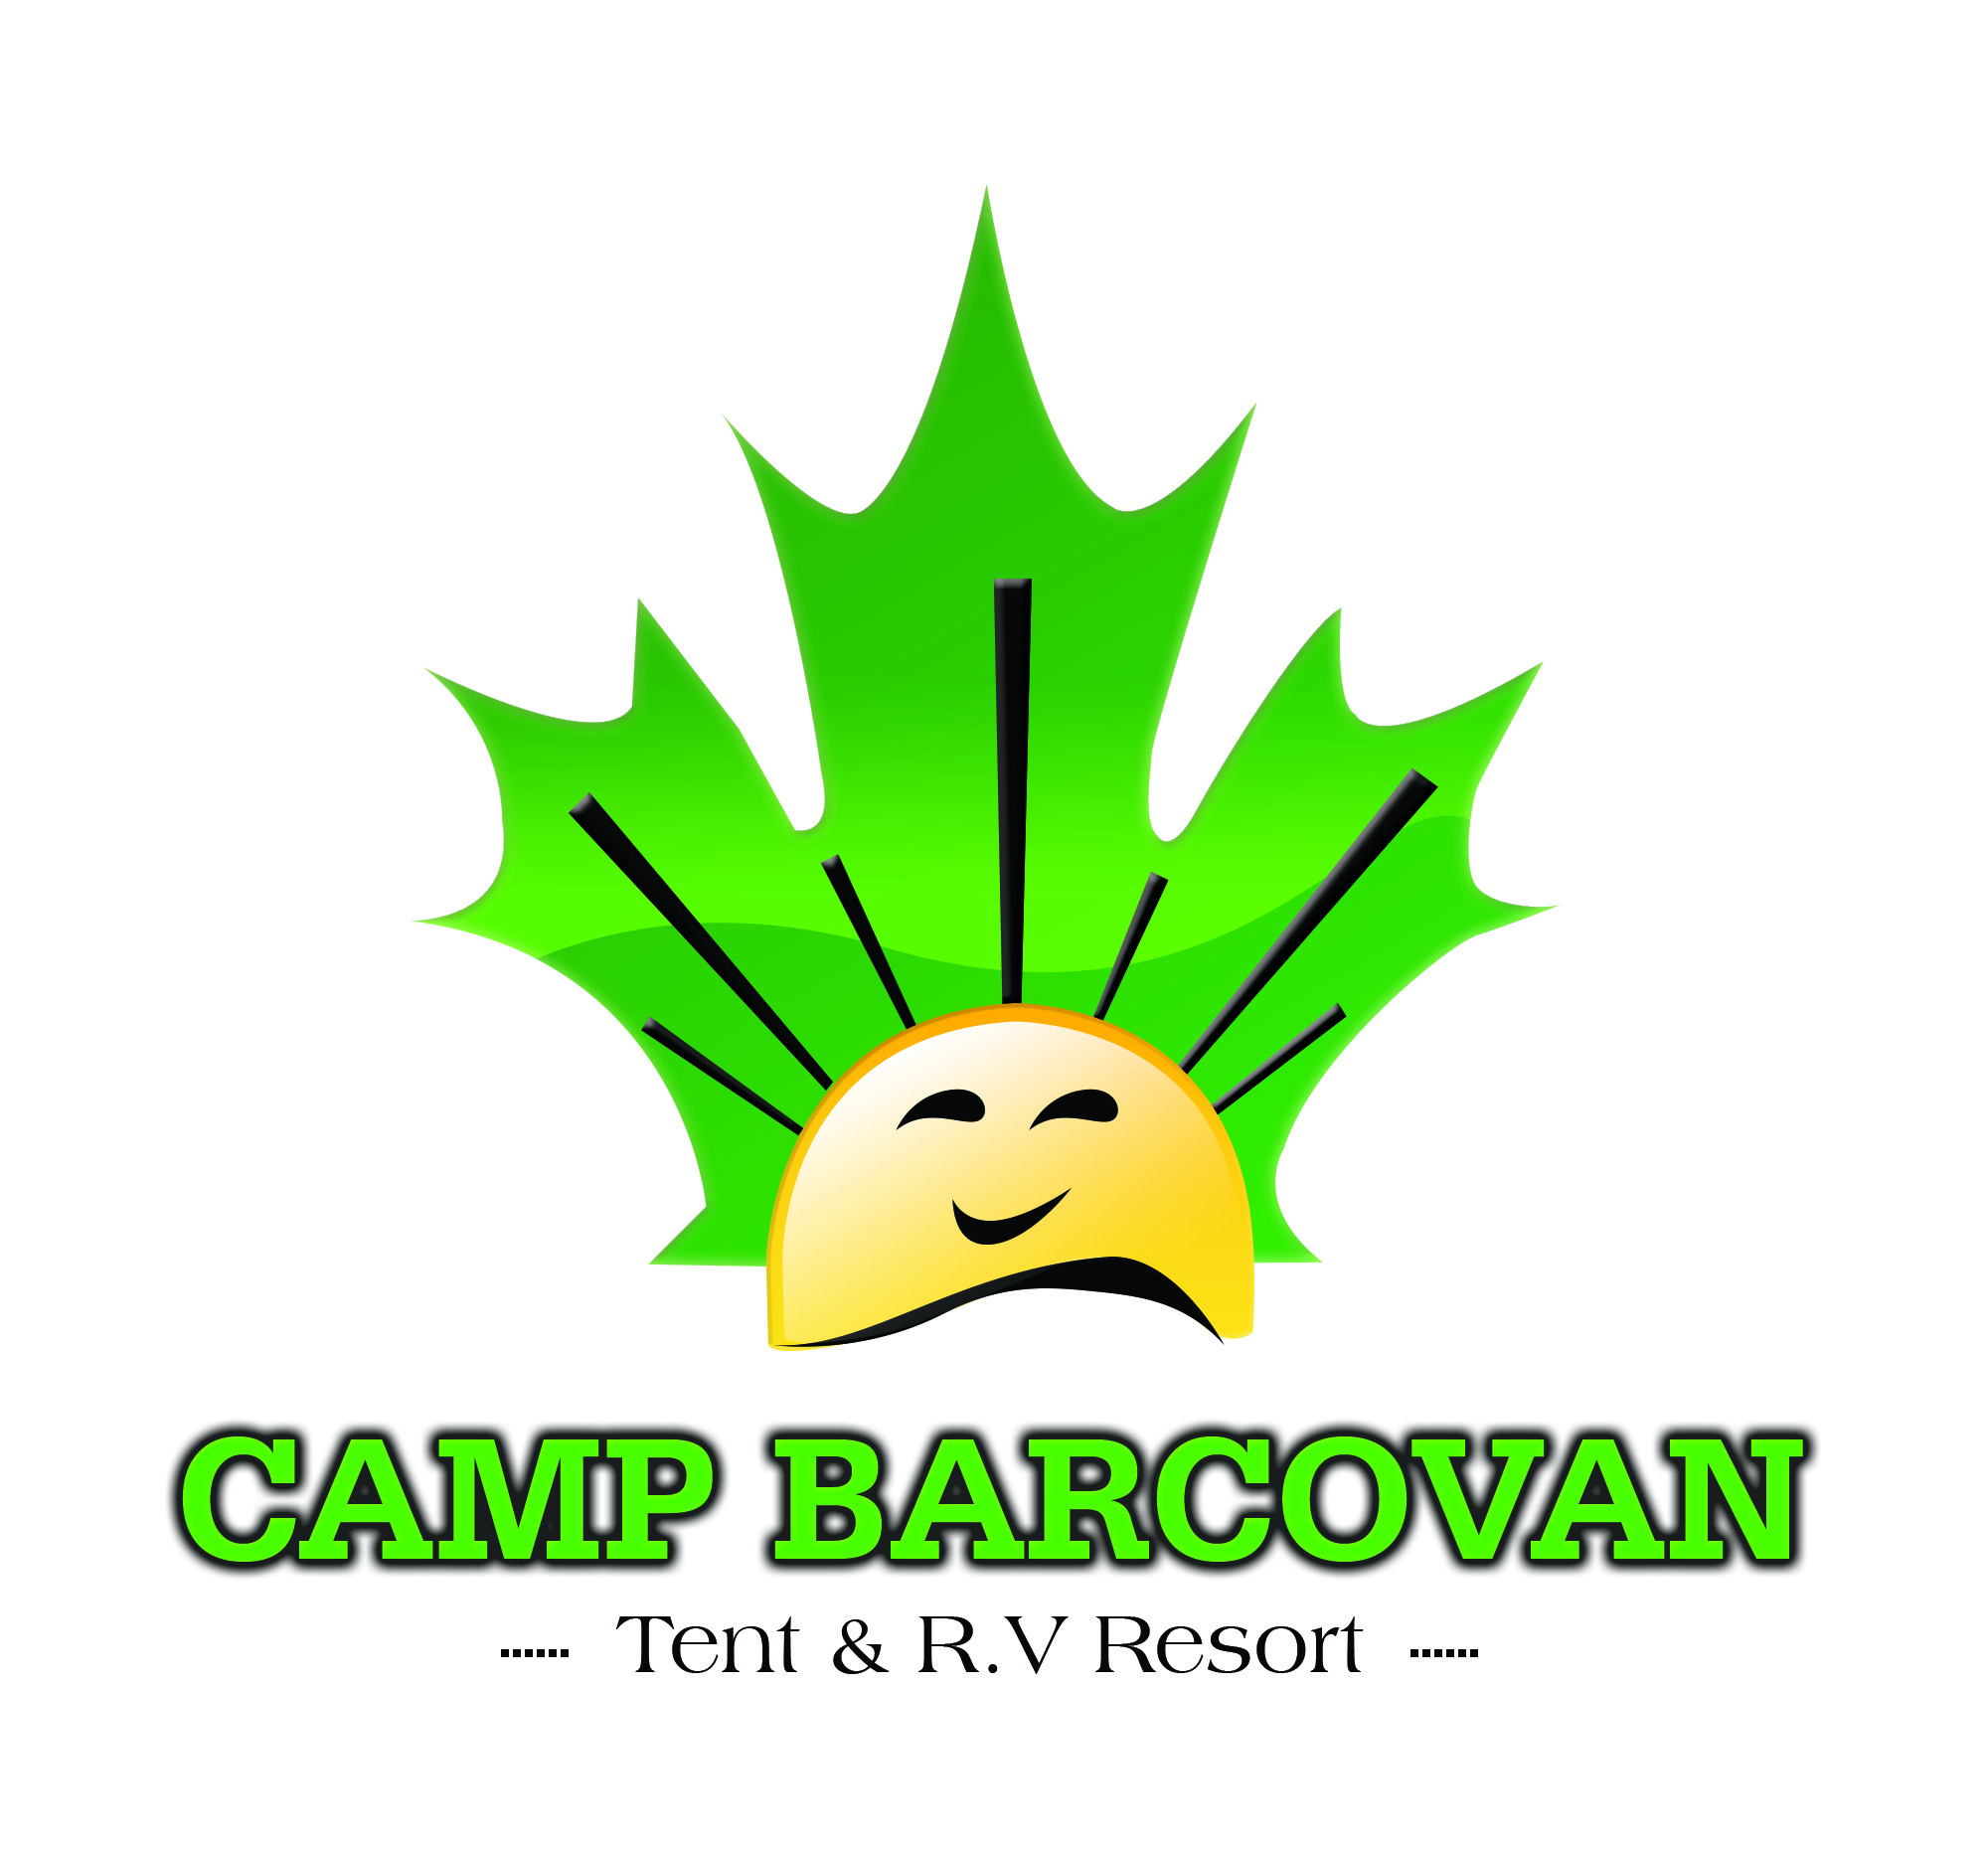 Camp-barcovan-logo